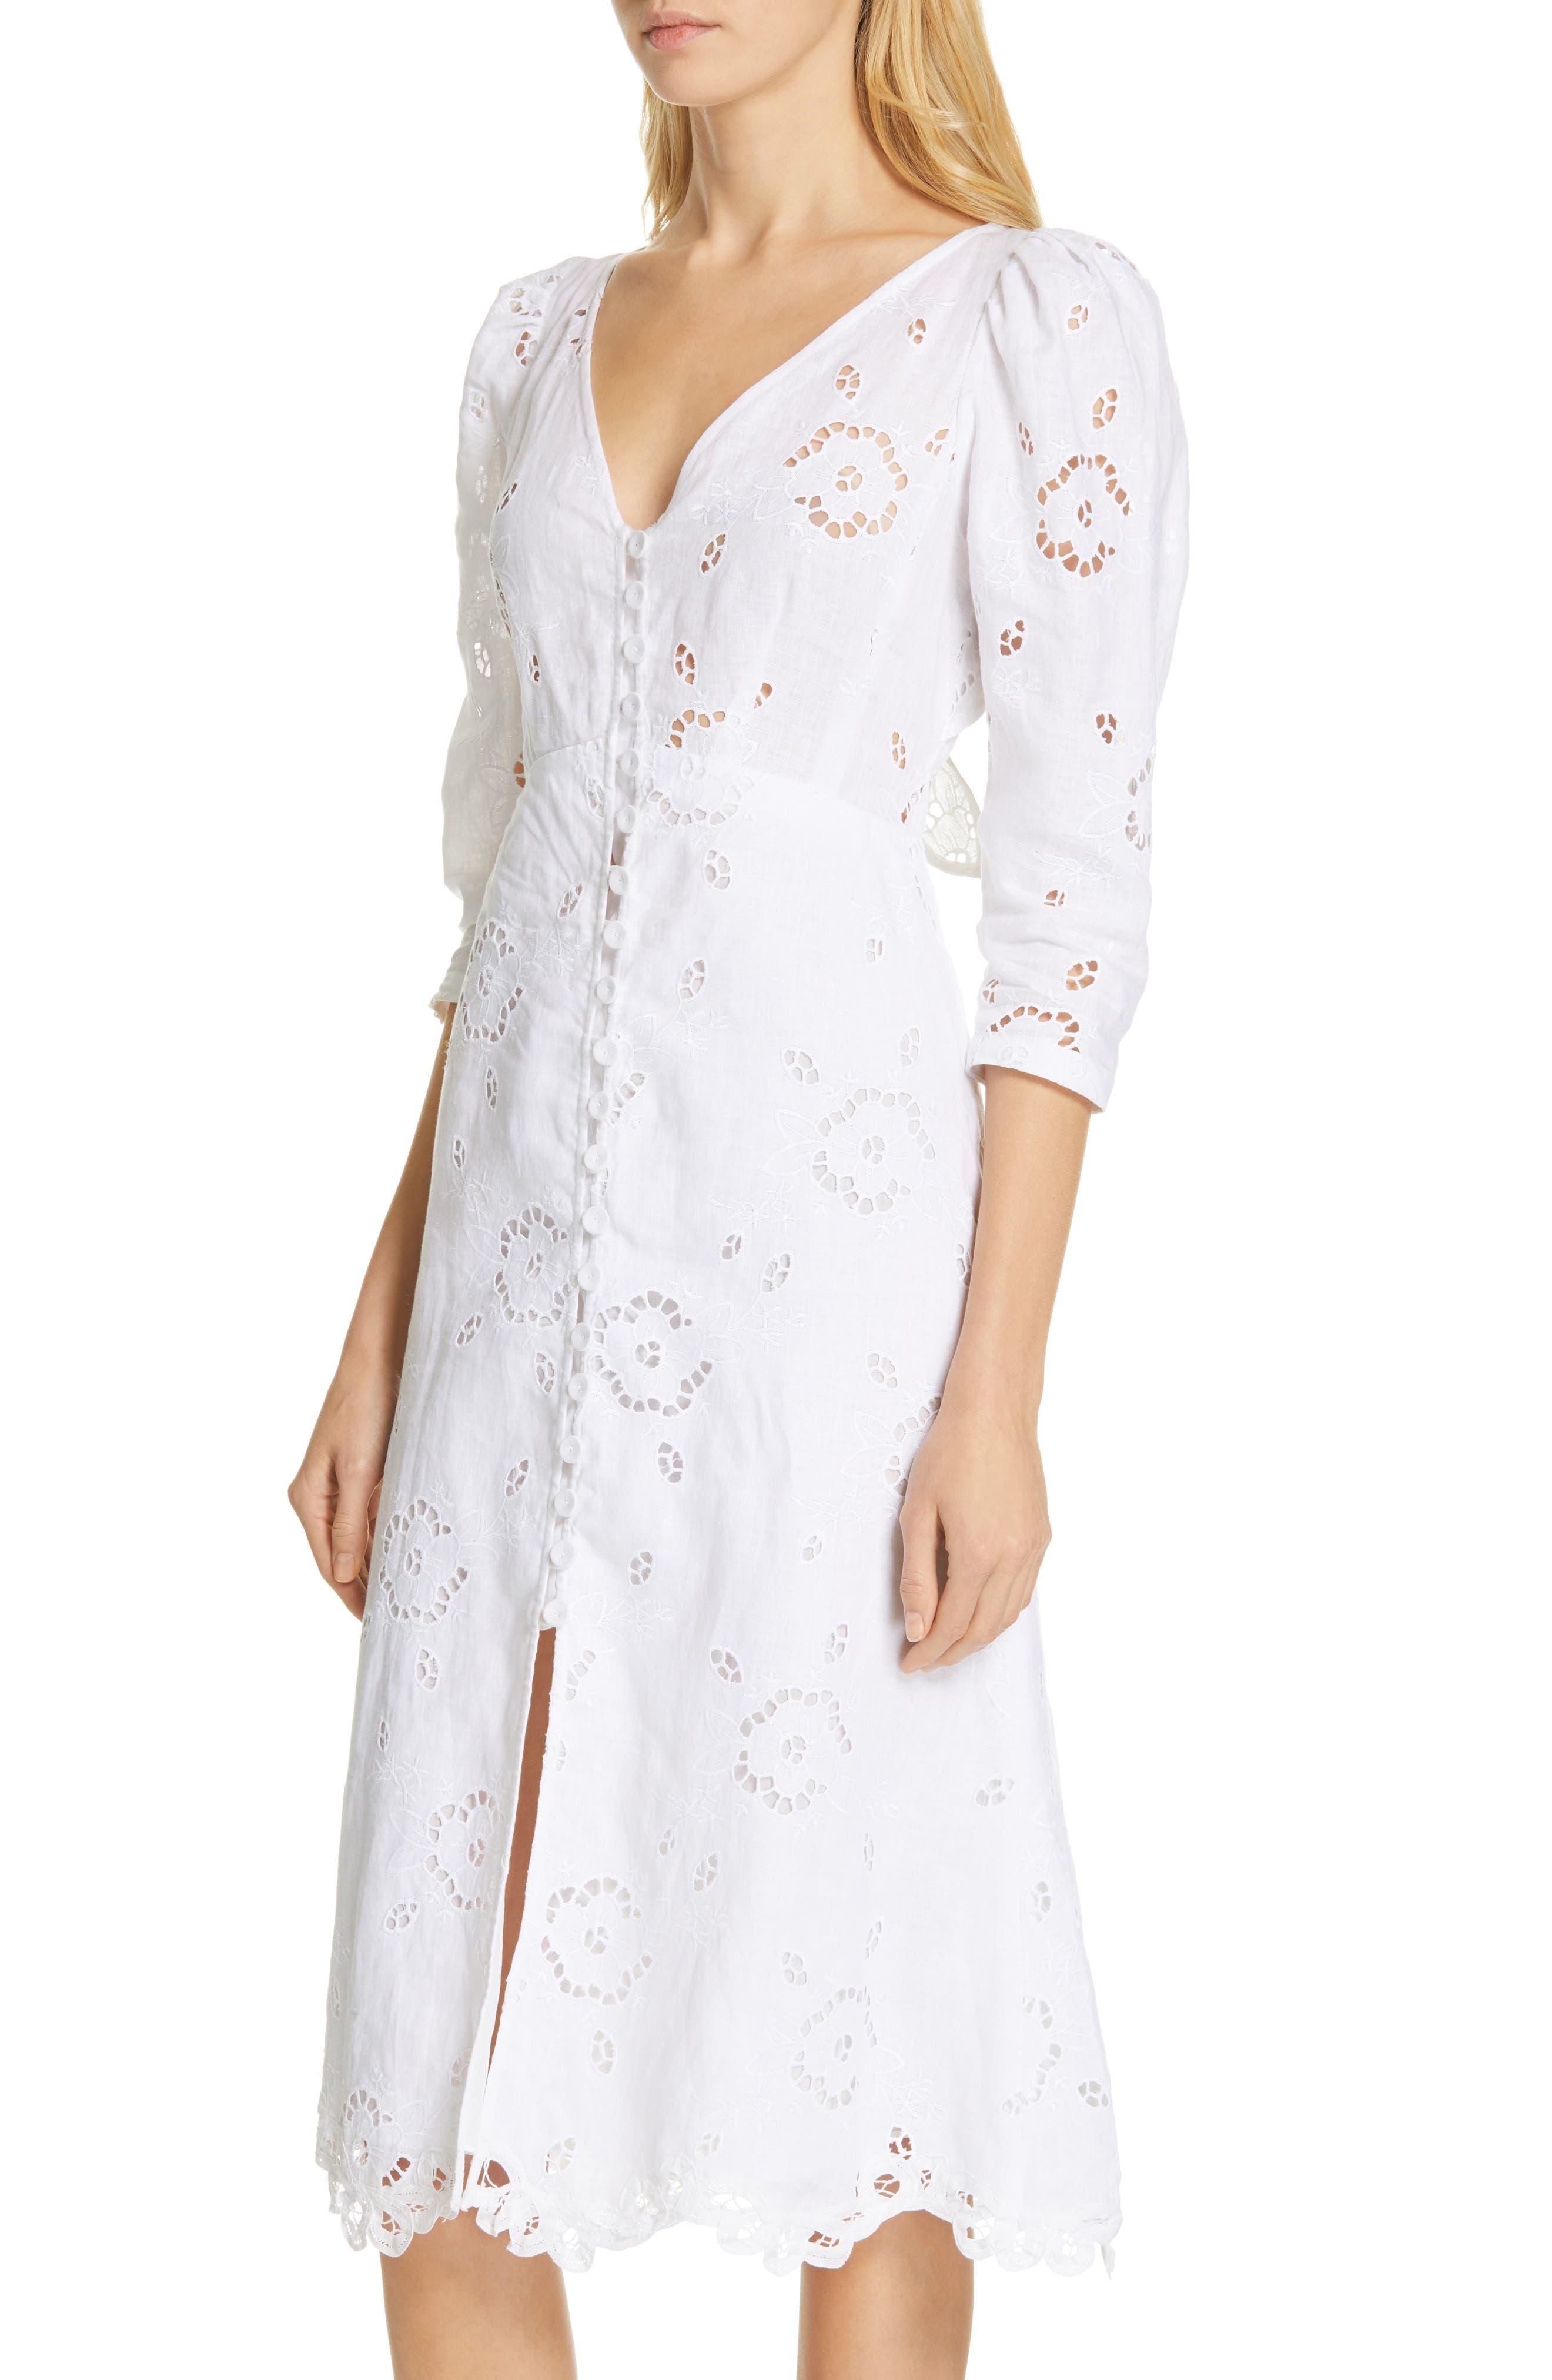 REBECCA TAYLOR, Terri Embroidered A-Line Dress, Alternate thumbnail 5, color, MILK